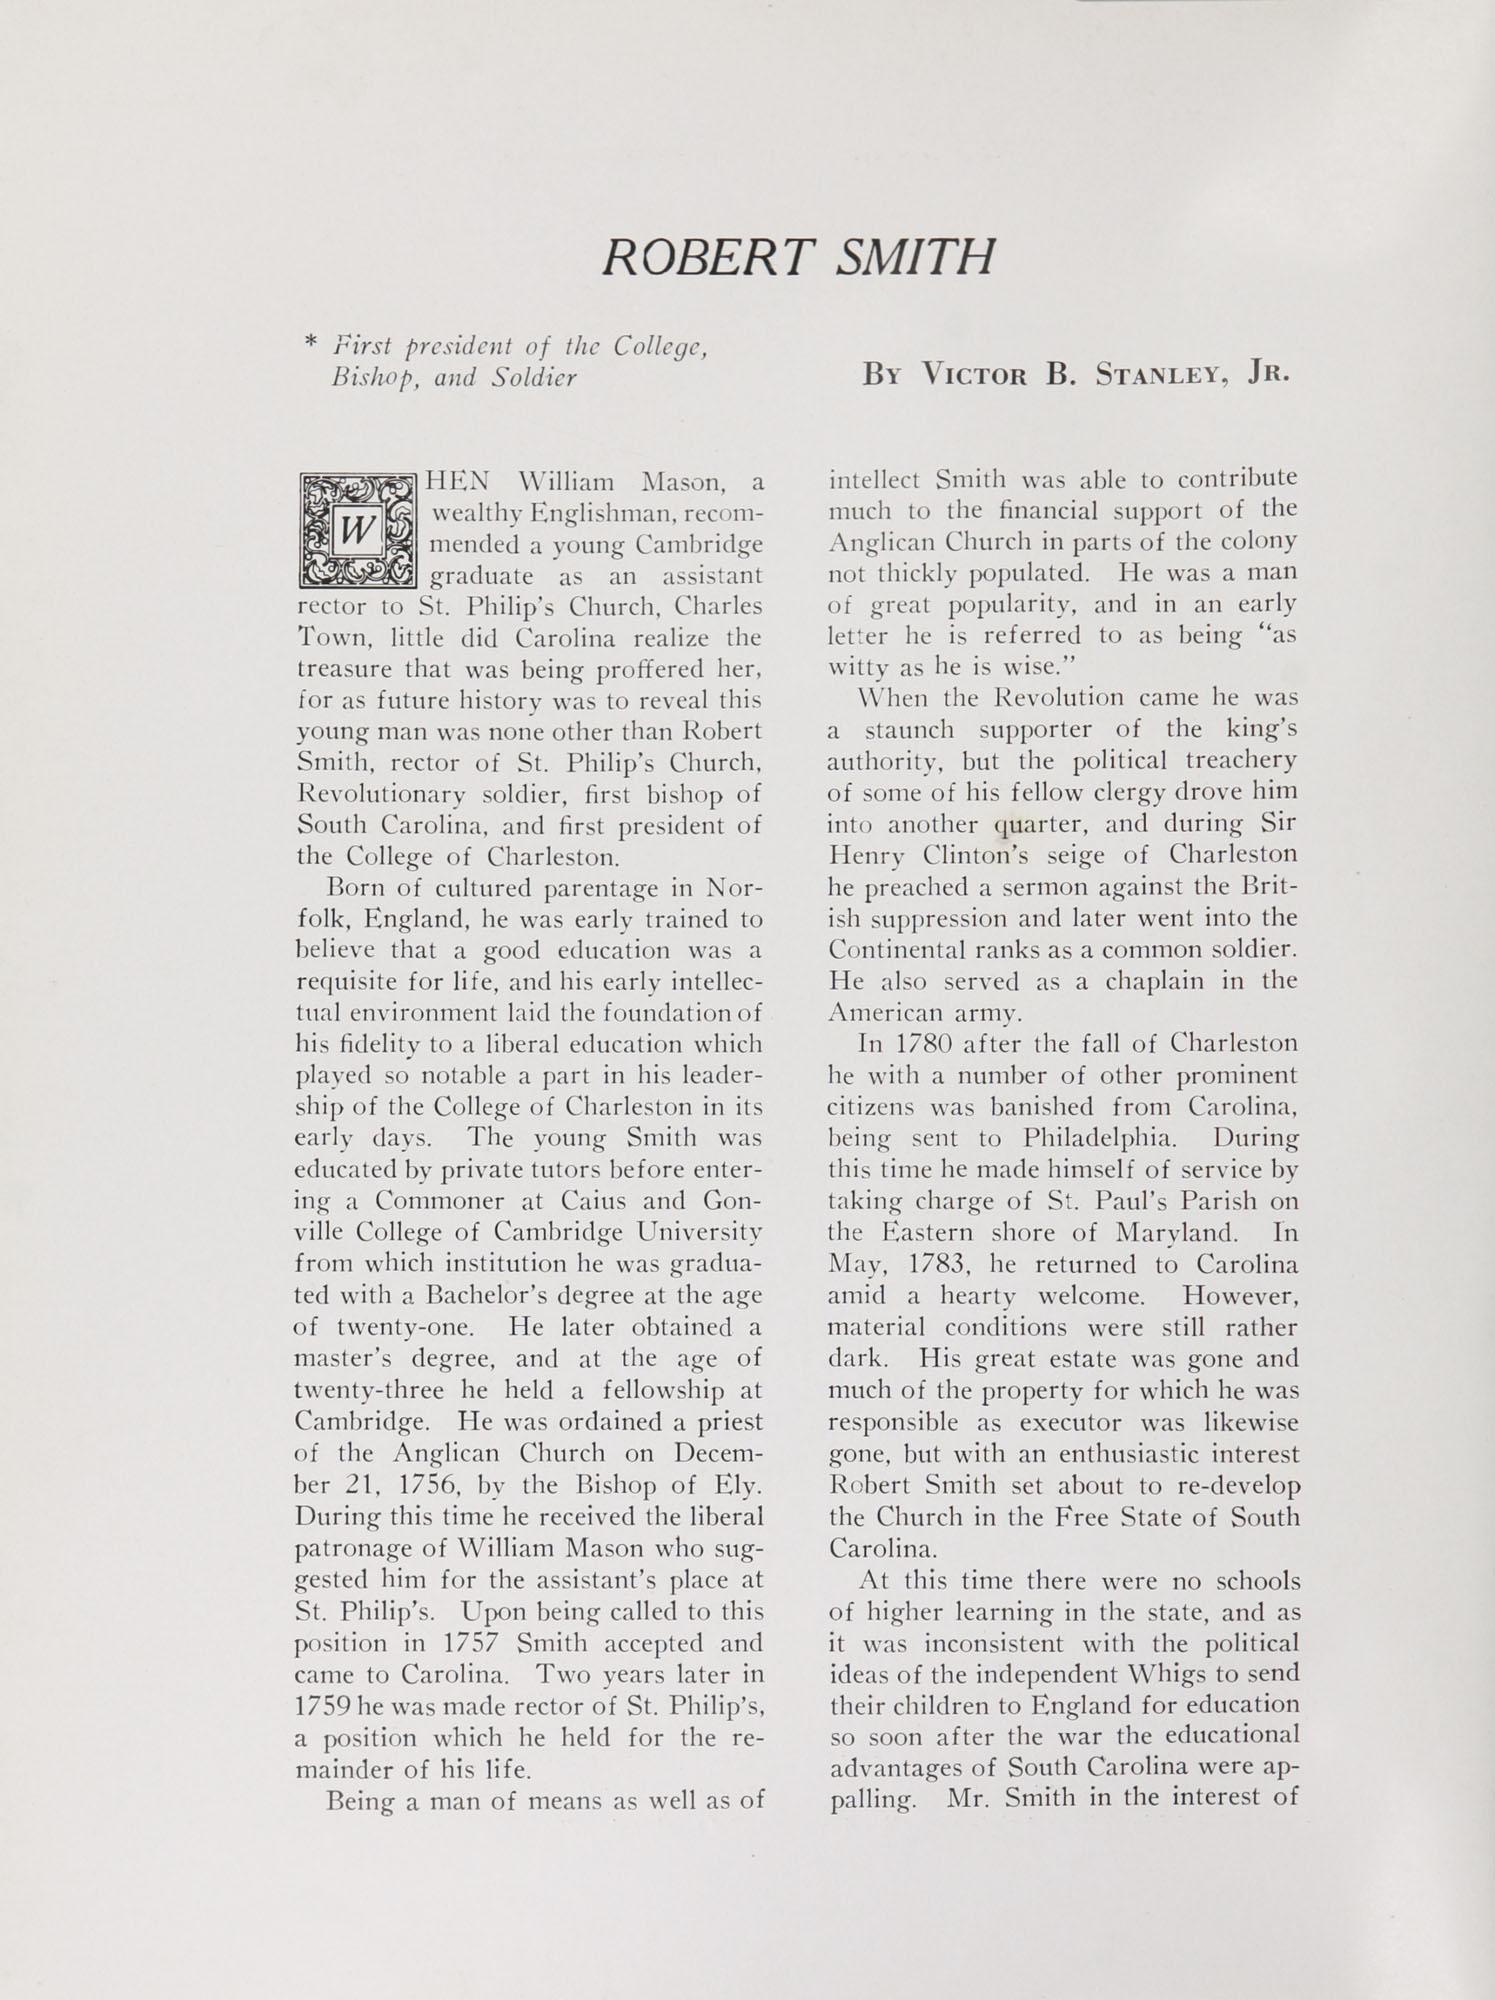 College of Charleston Magazine, 1938-1939, Vol. XXXXII No. 1, page 14